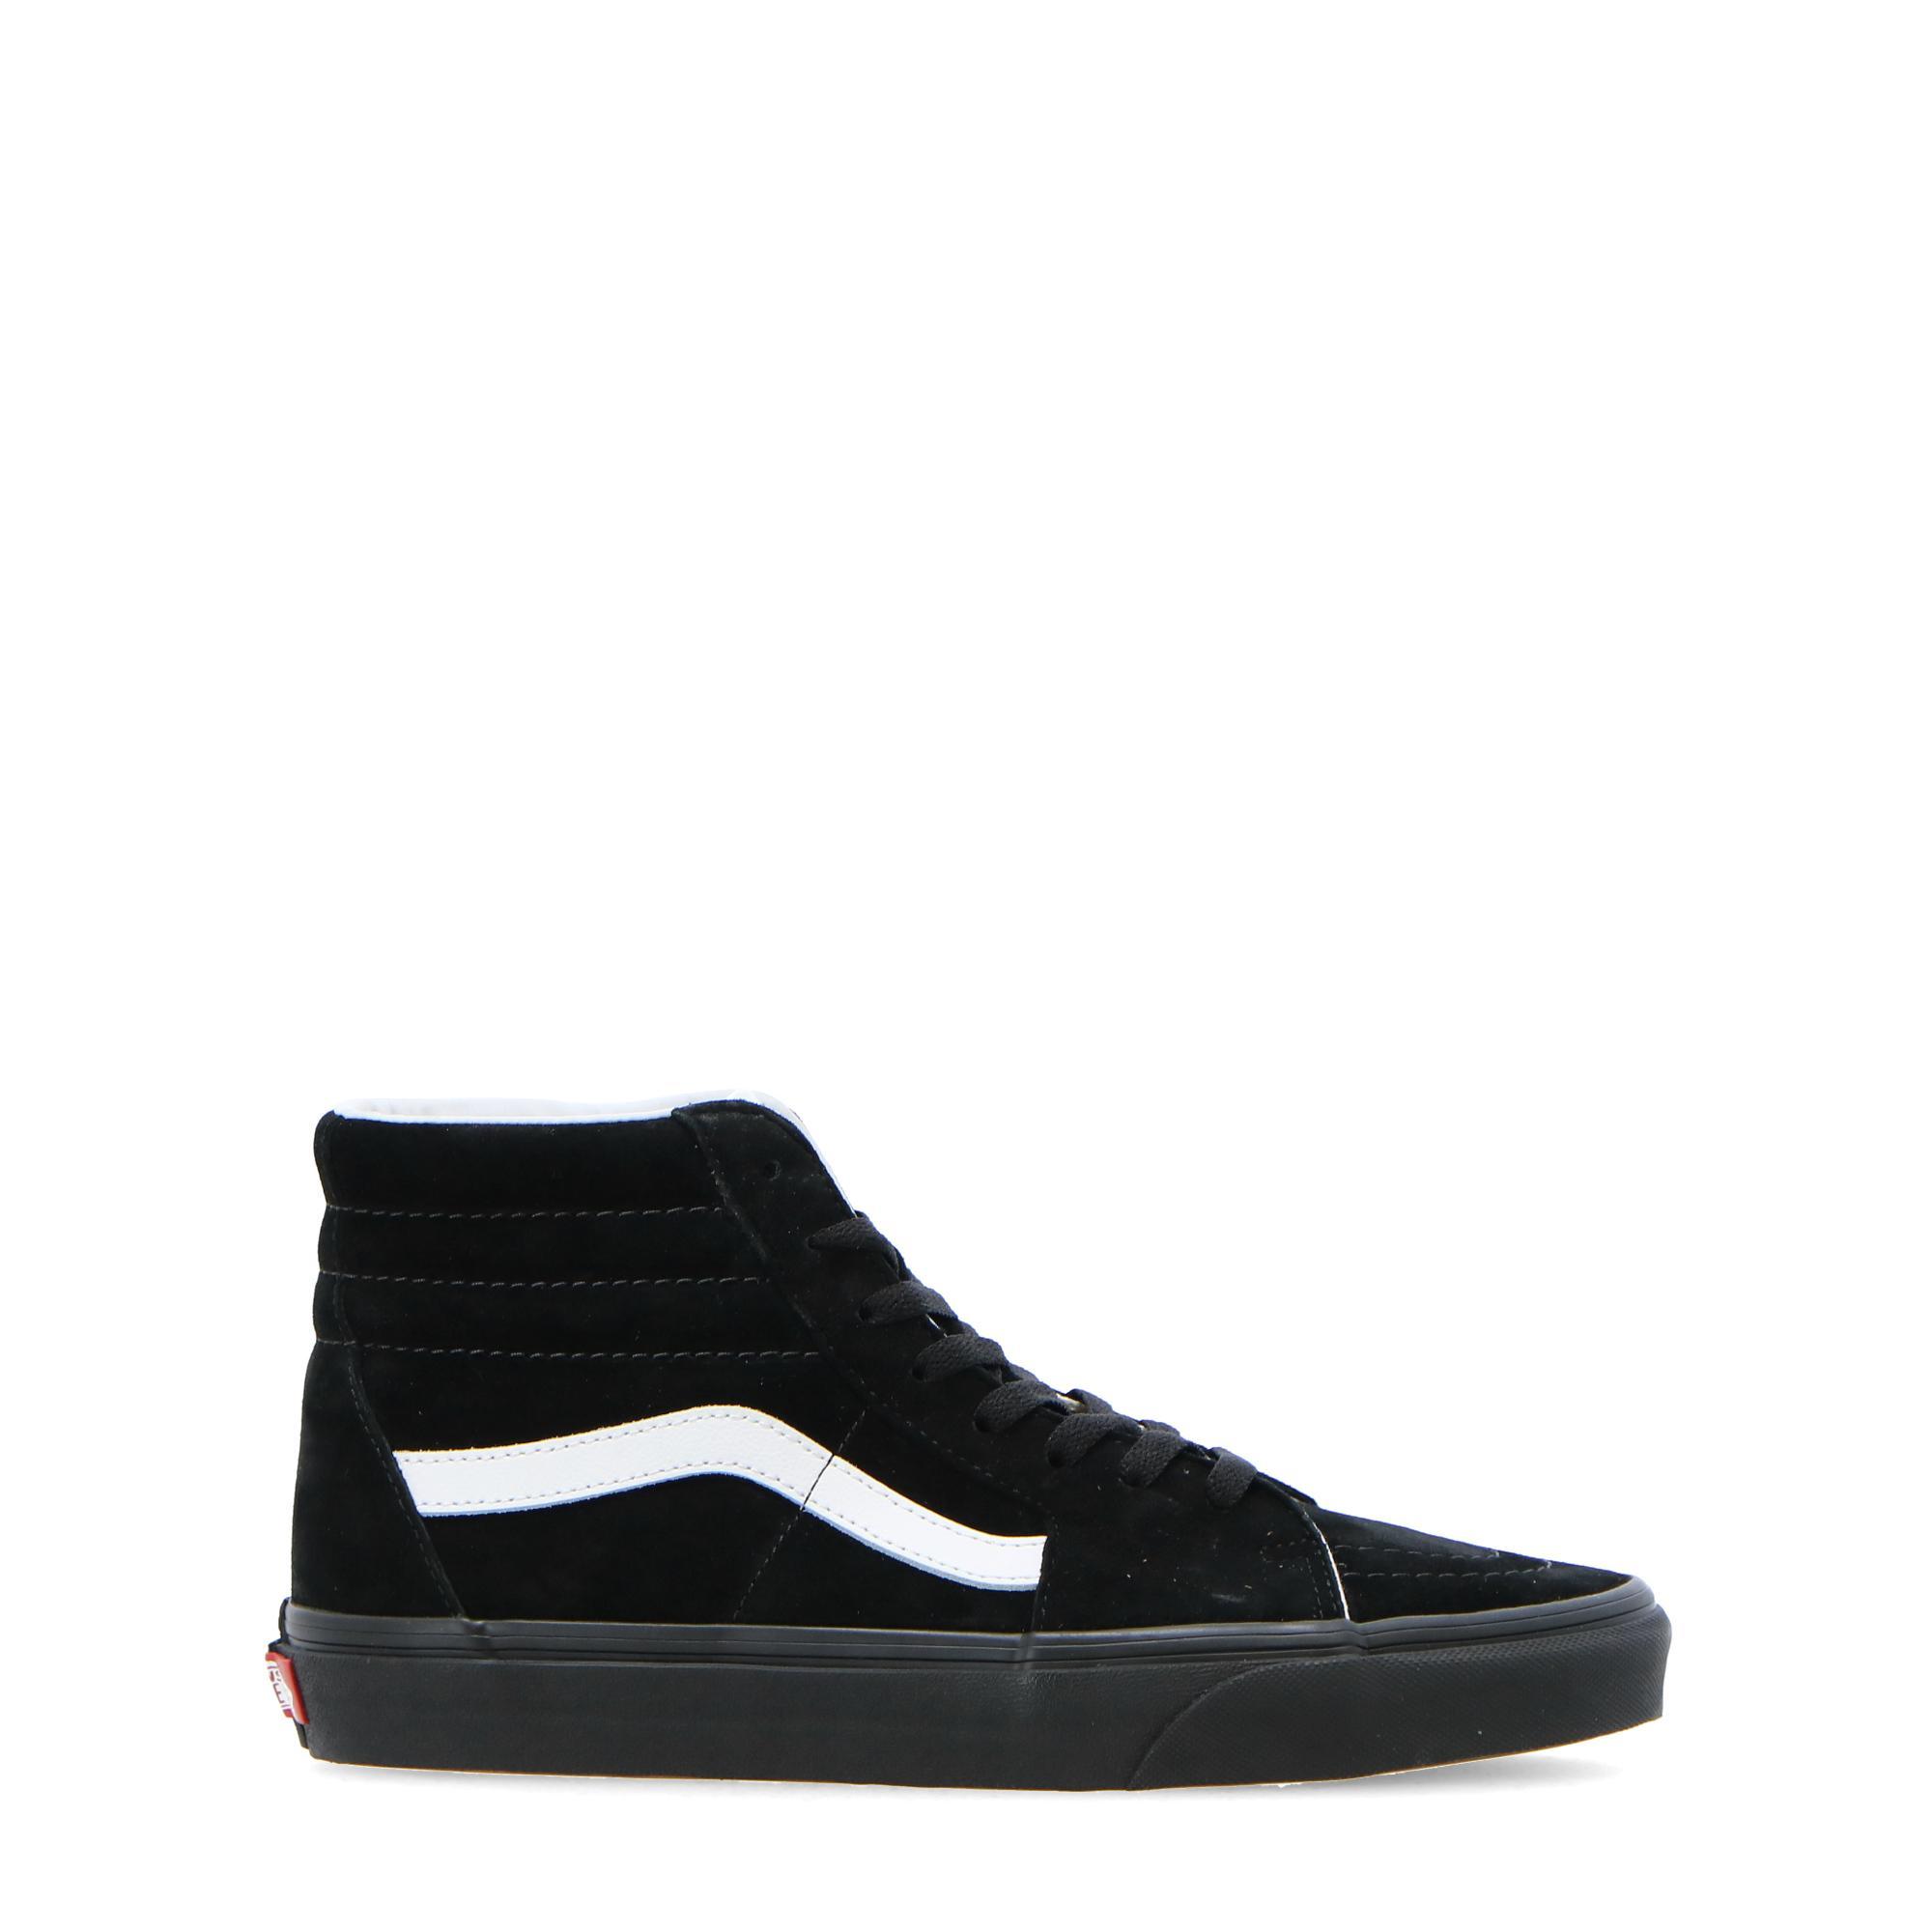 Vans Ua Sk8-hi (pig suede) black black